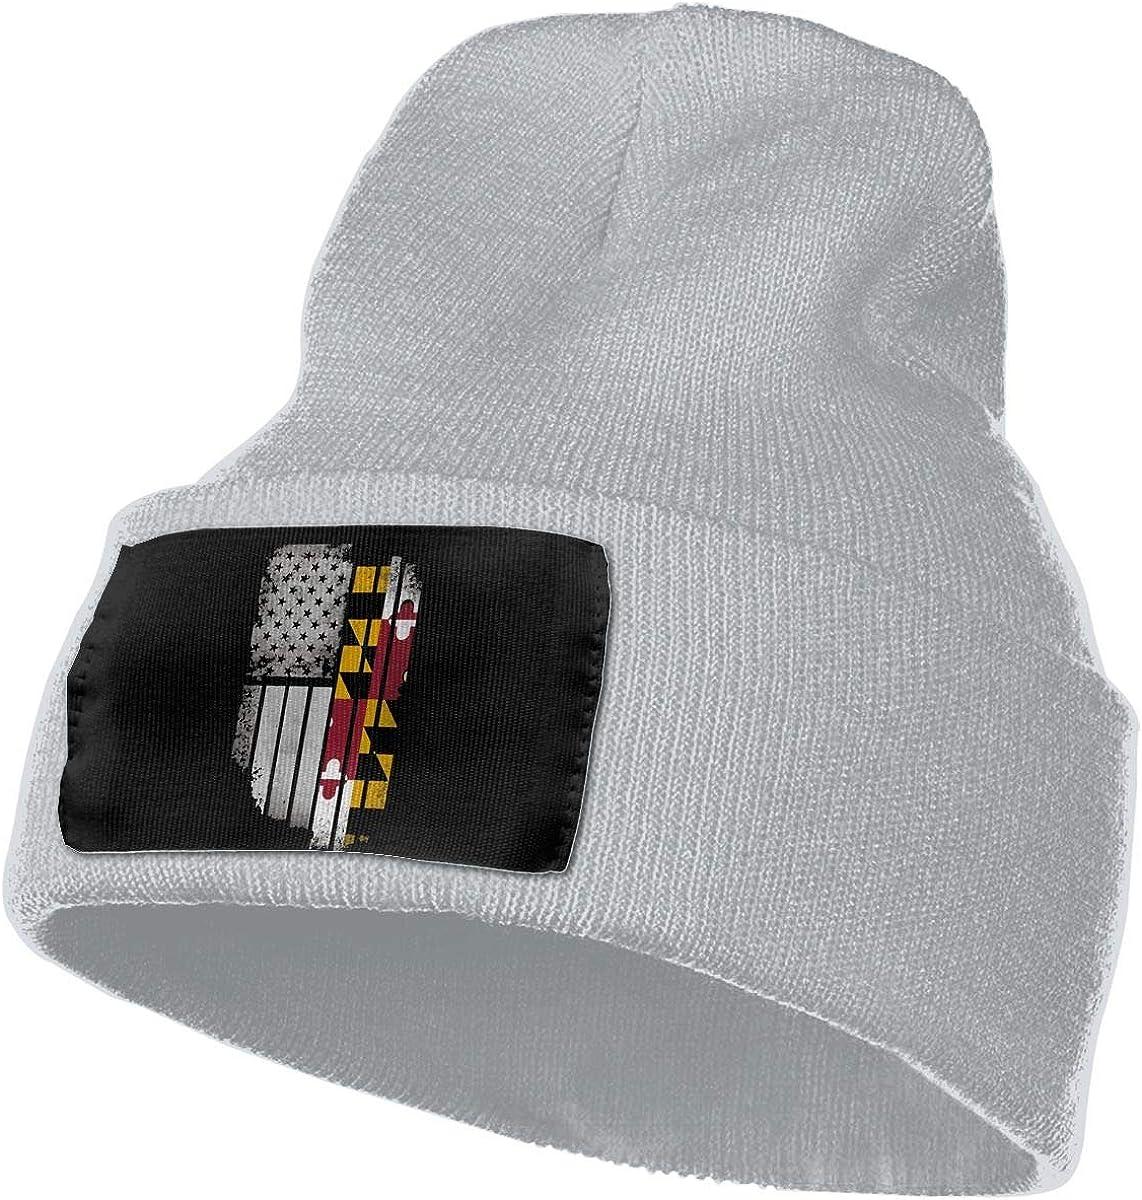 Mens Womens 100/% Acrylic Knit Hat Cap USA Vintage Maryland Flag Soft Skull Cap